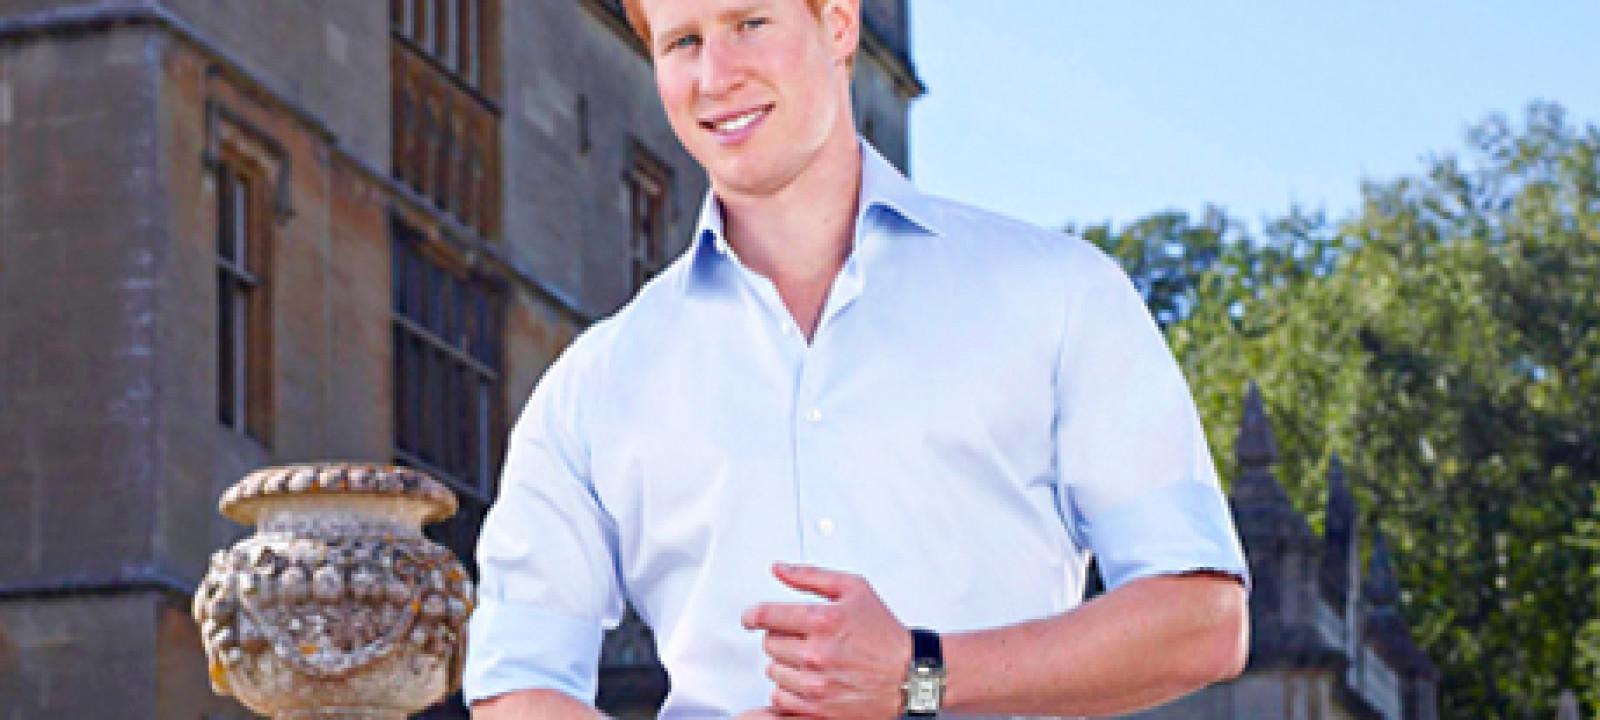 Prince Harry Lookalike